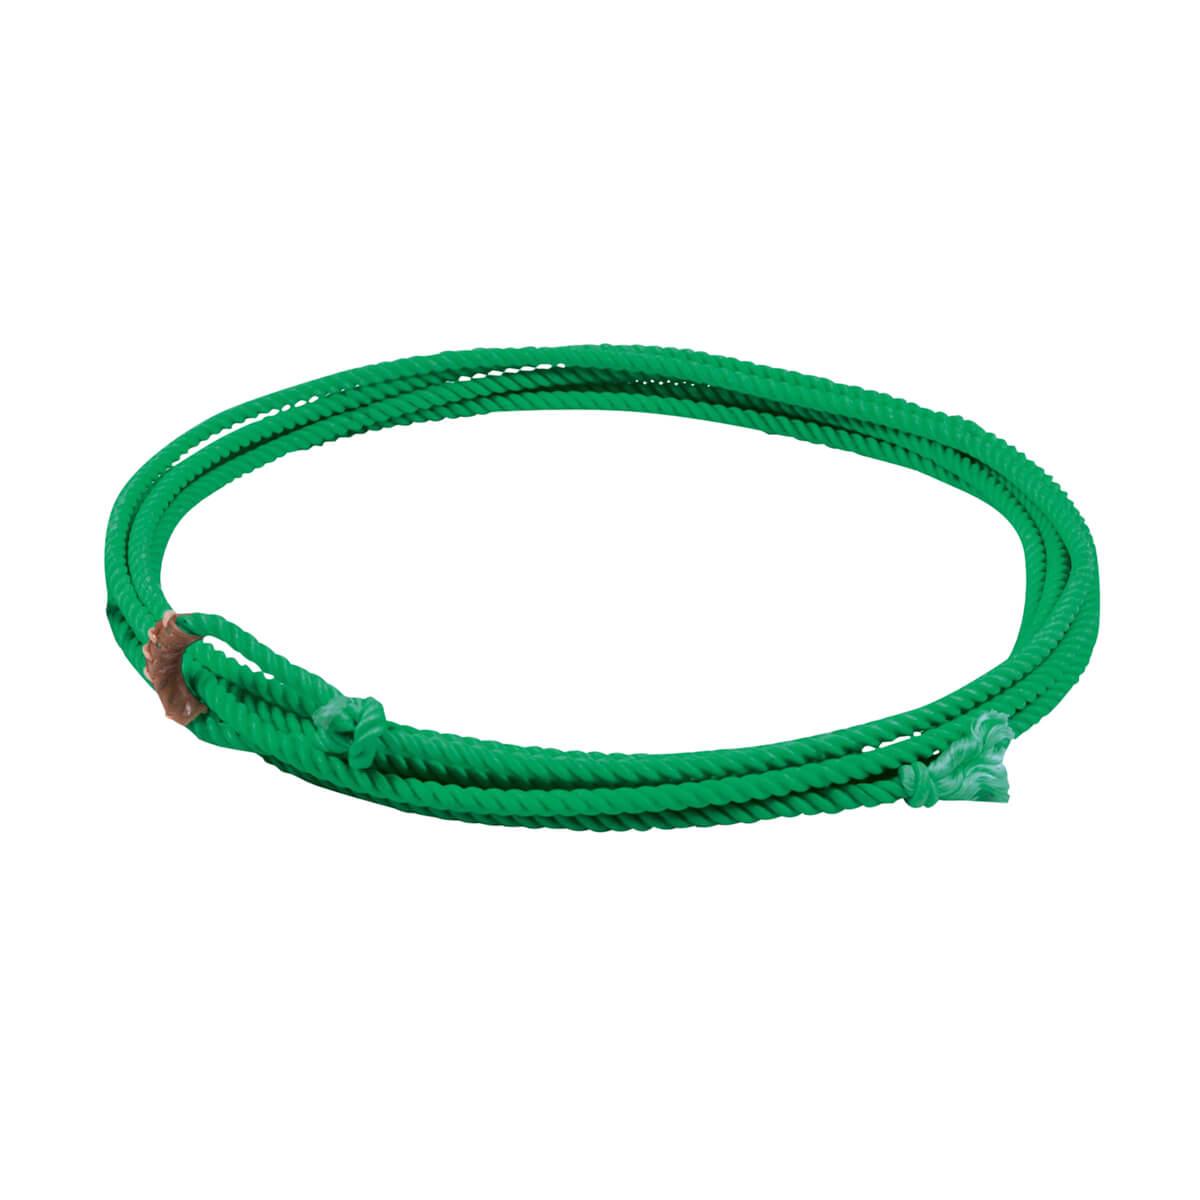 Little Looper Kids Rope - Green - 12